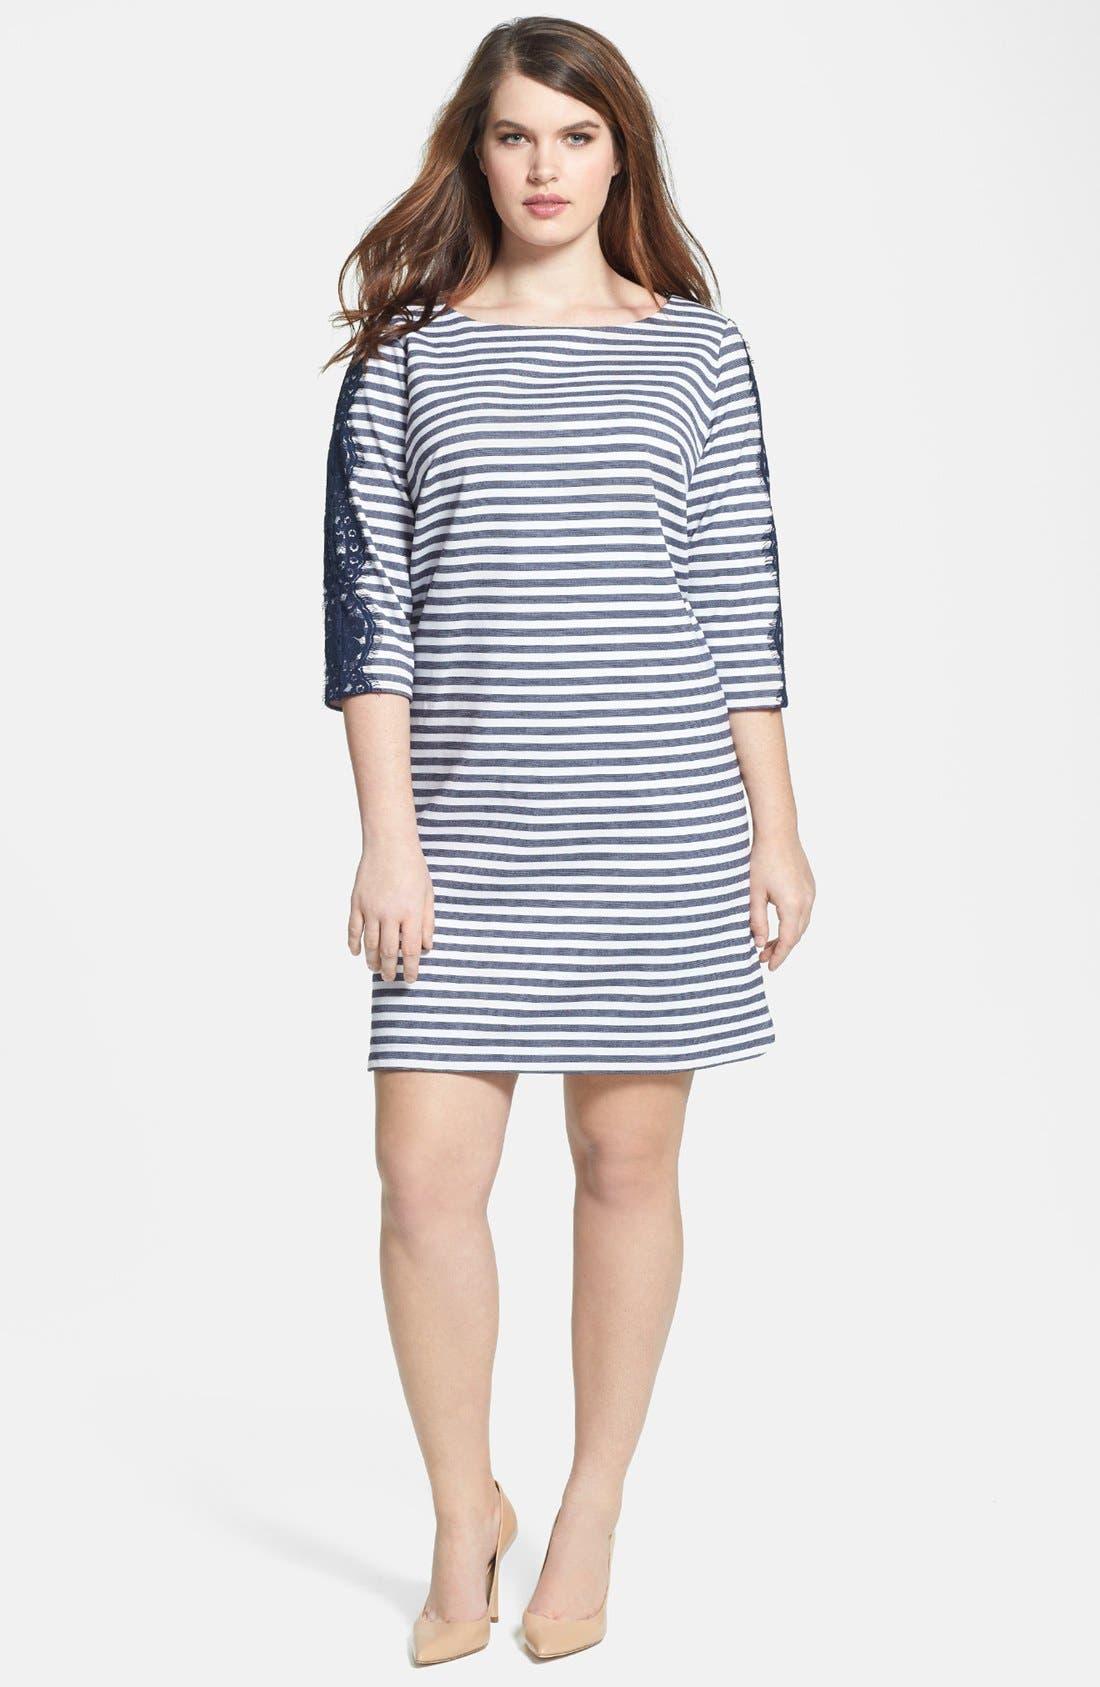 Alternate Image 1 Selected - Eliza J Stripe & Lace Ponte Knit Shift Dress (Plus Size)